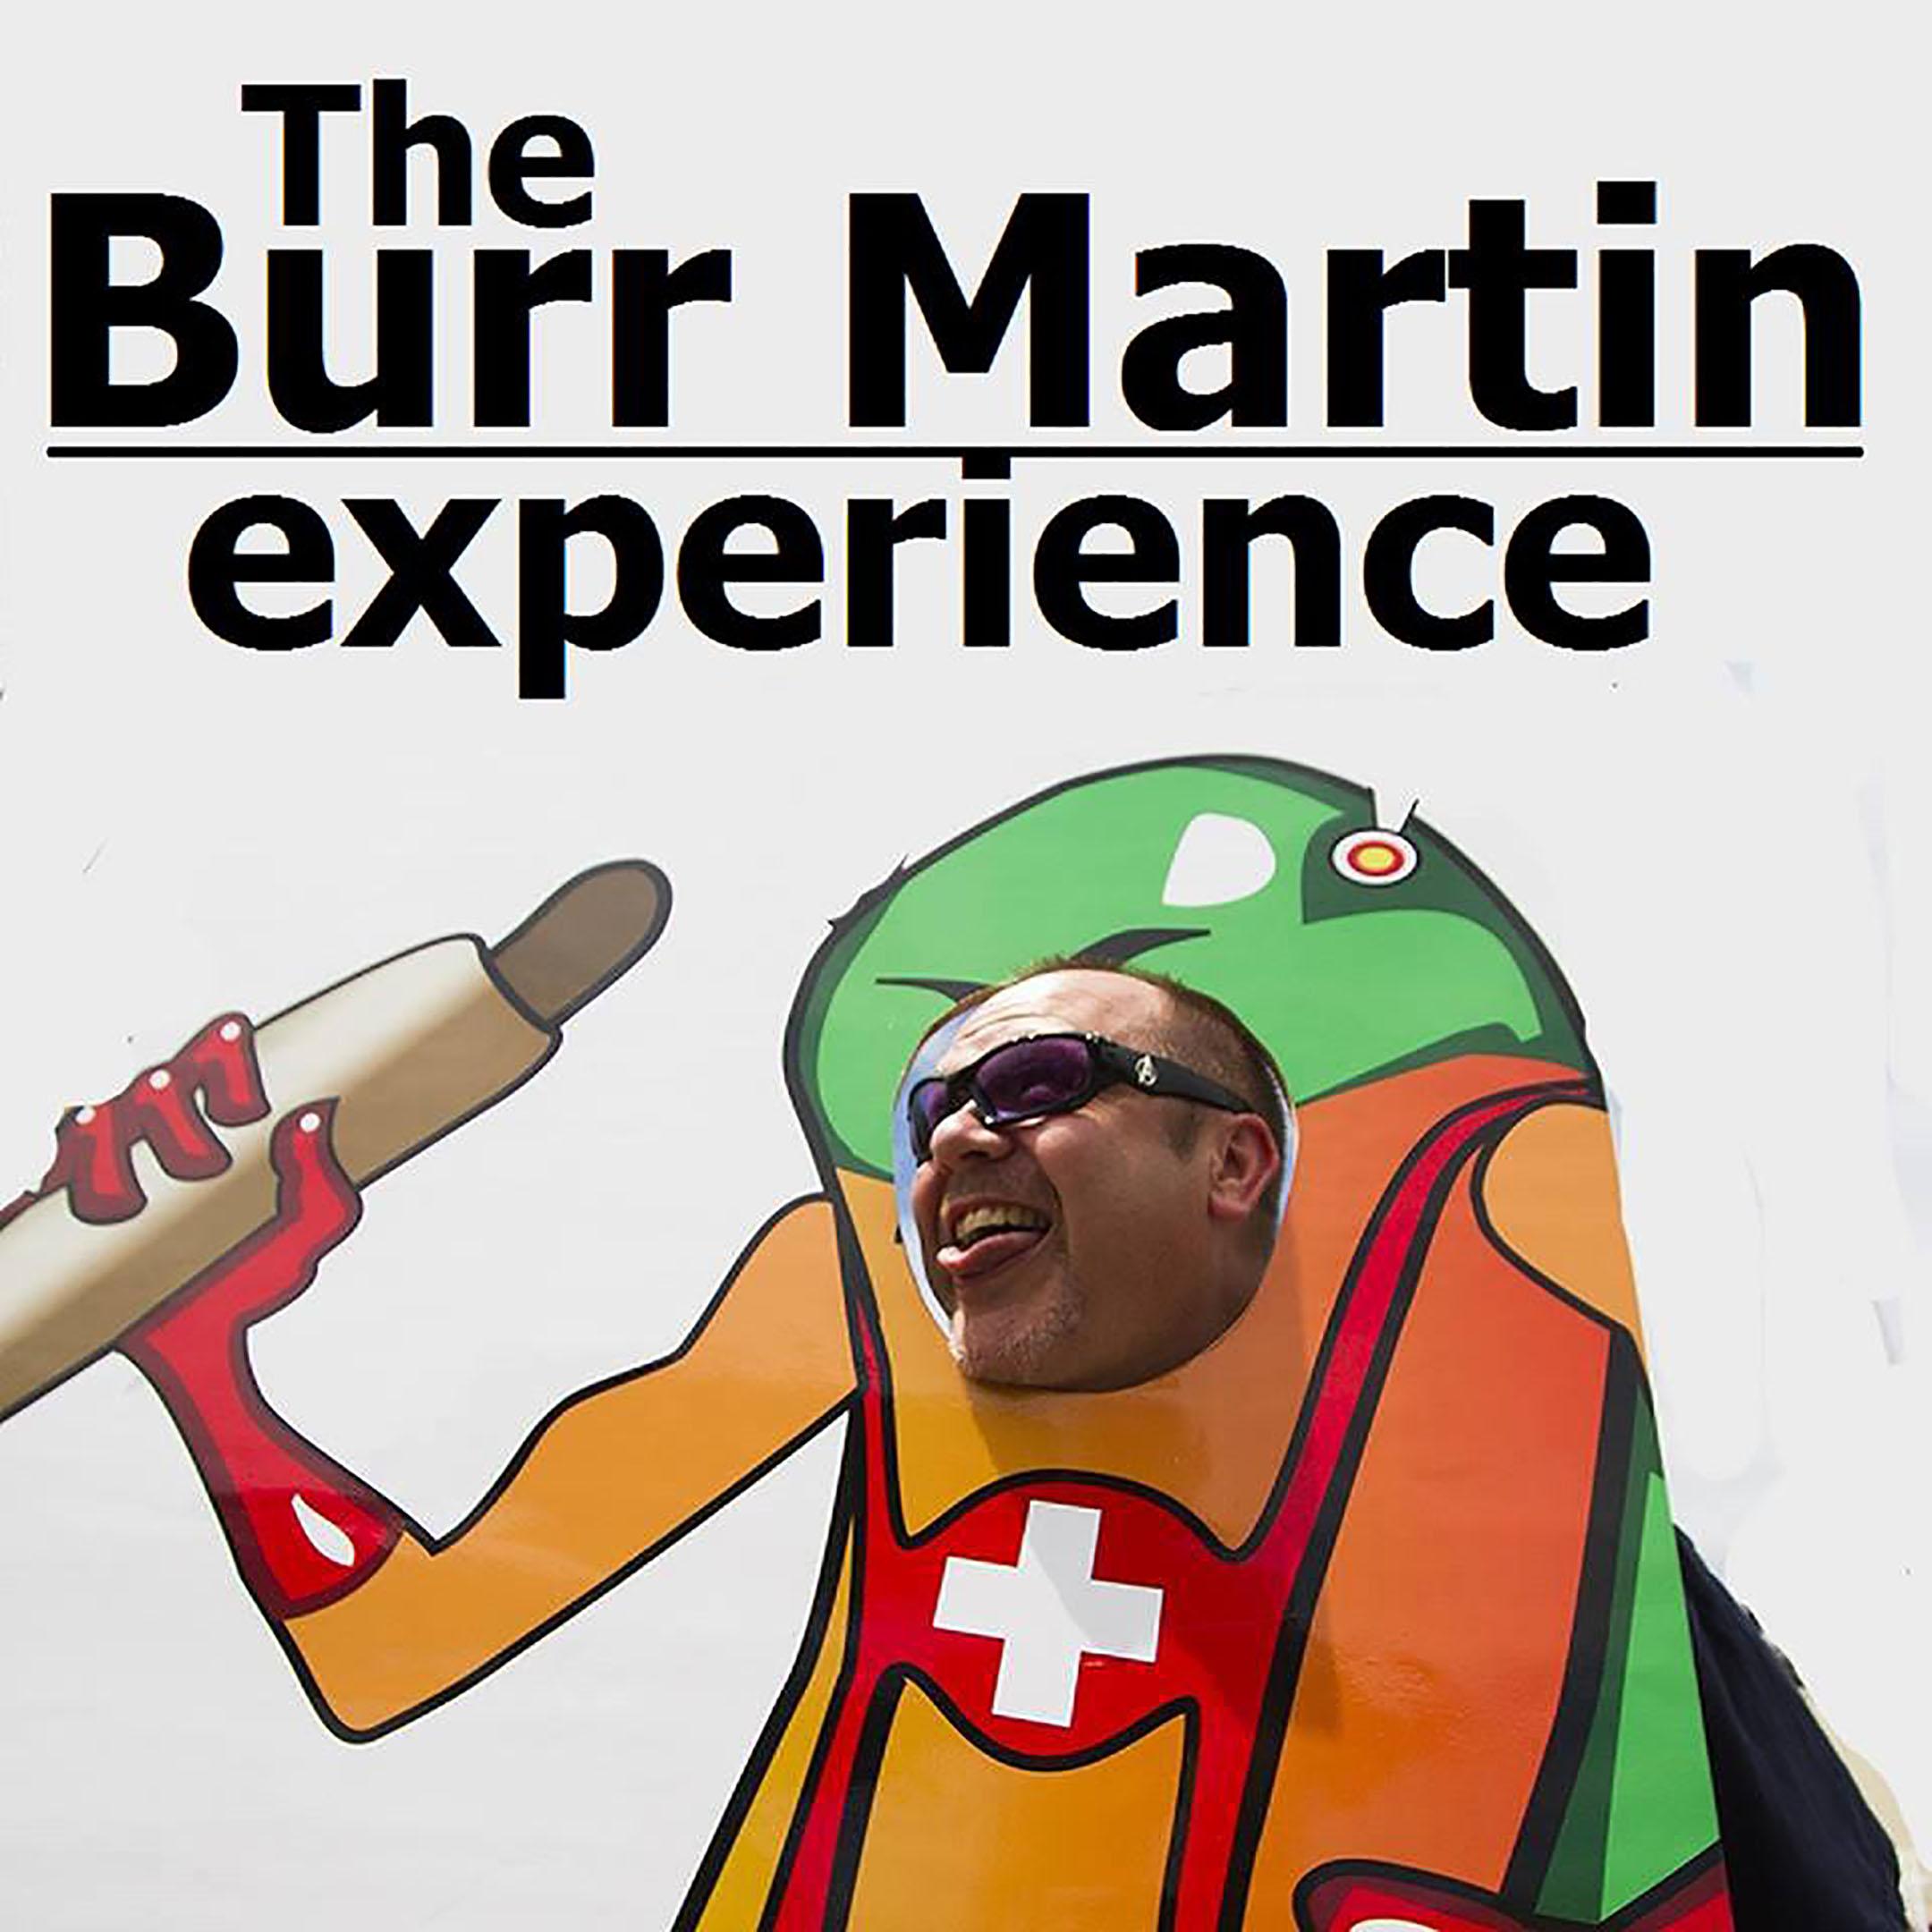 Burr Martin Experience